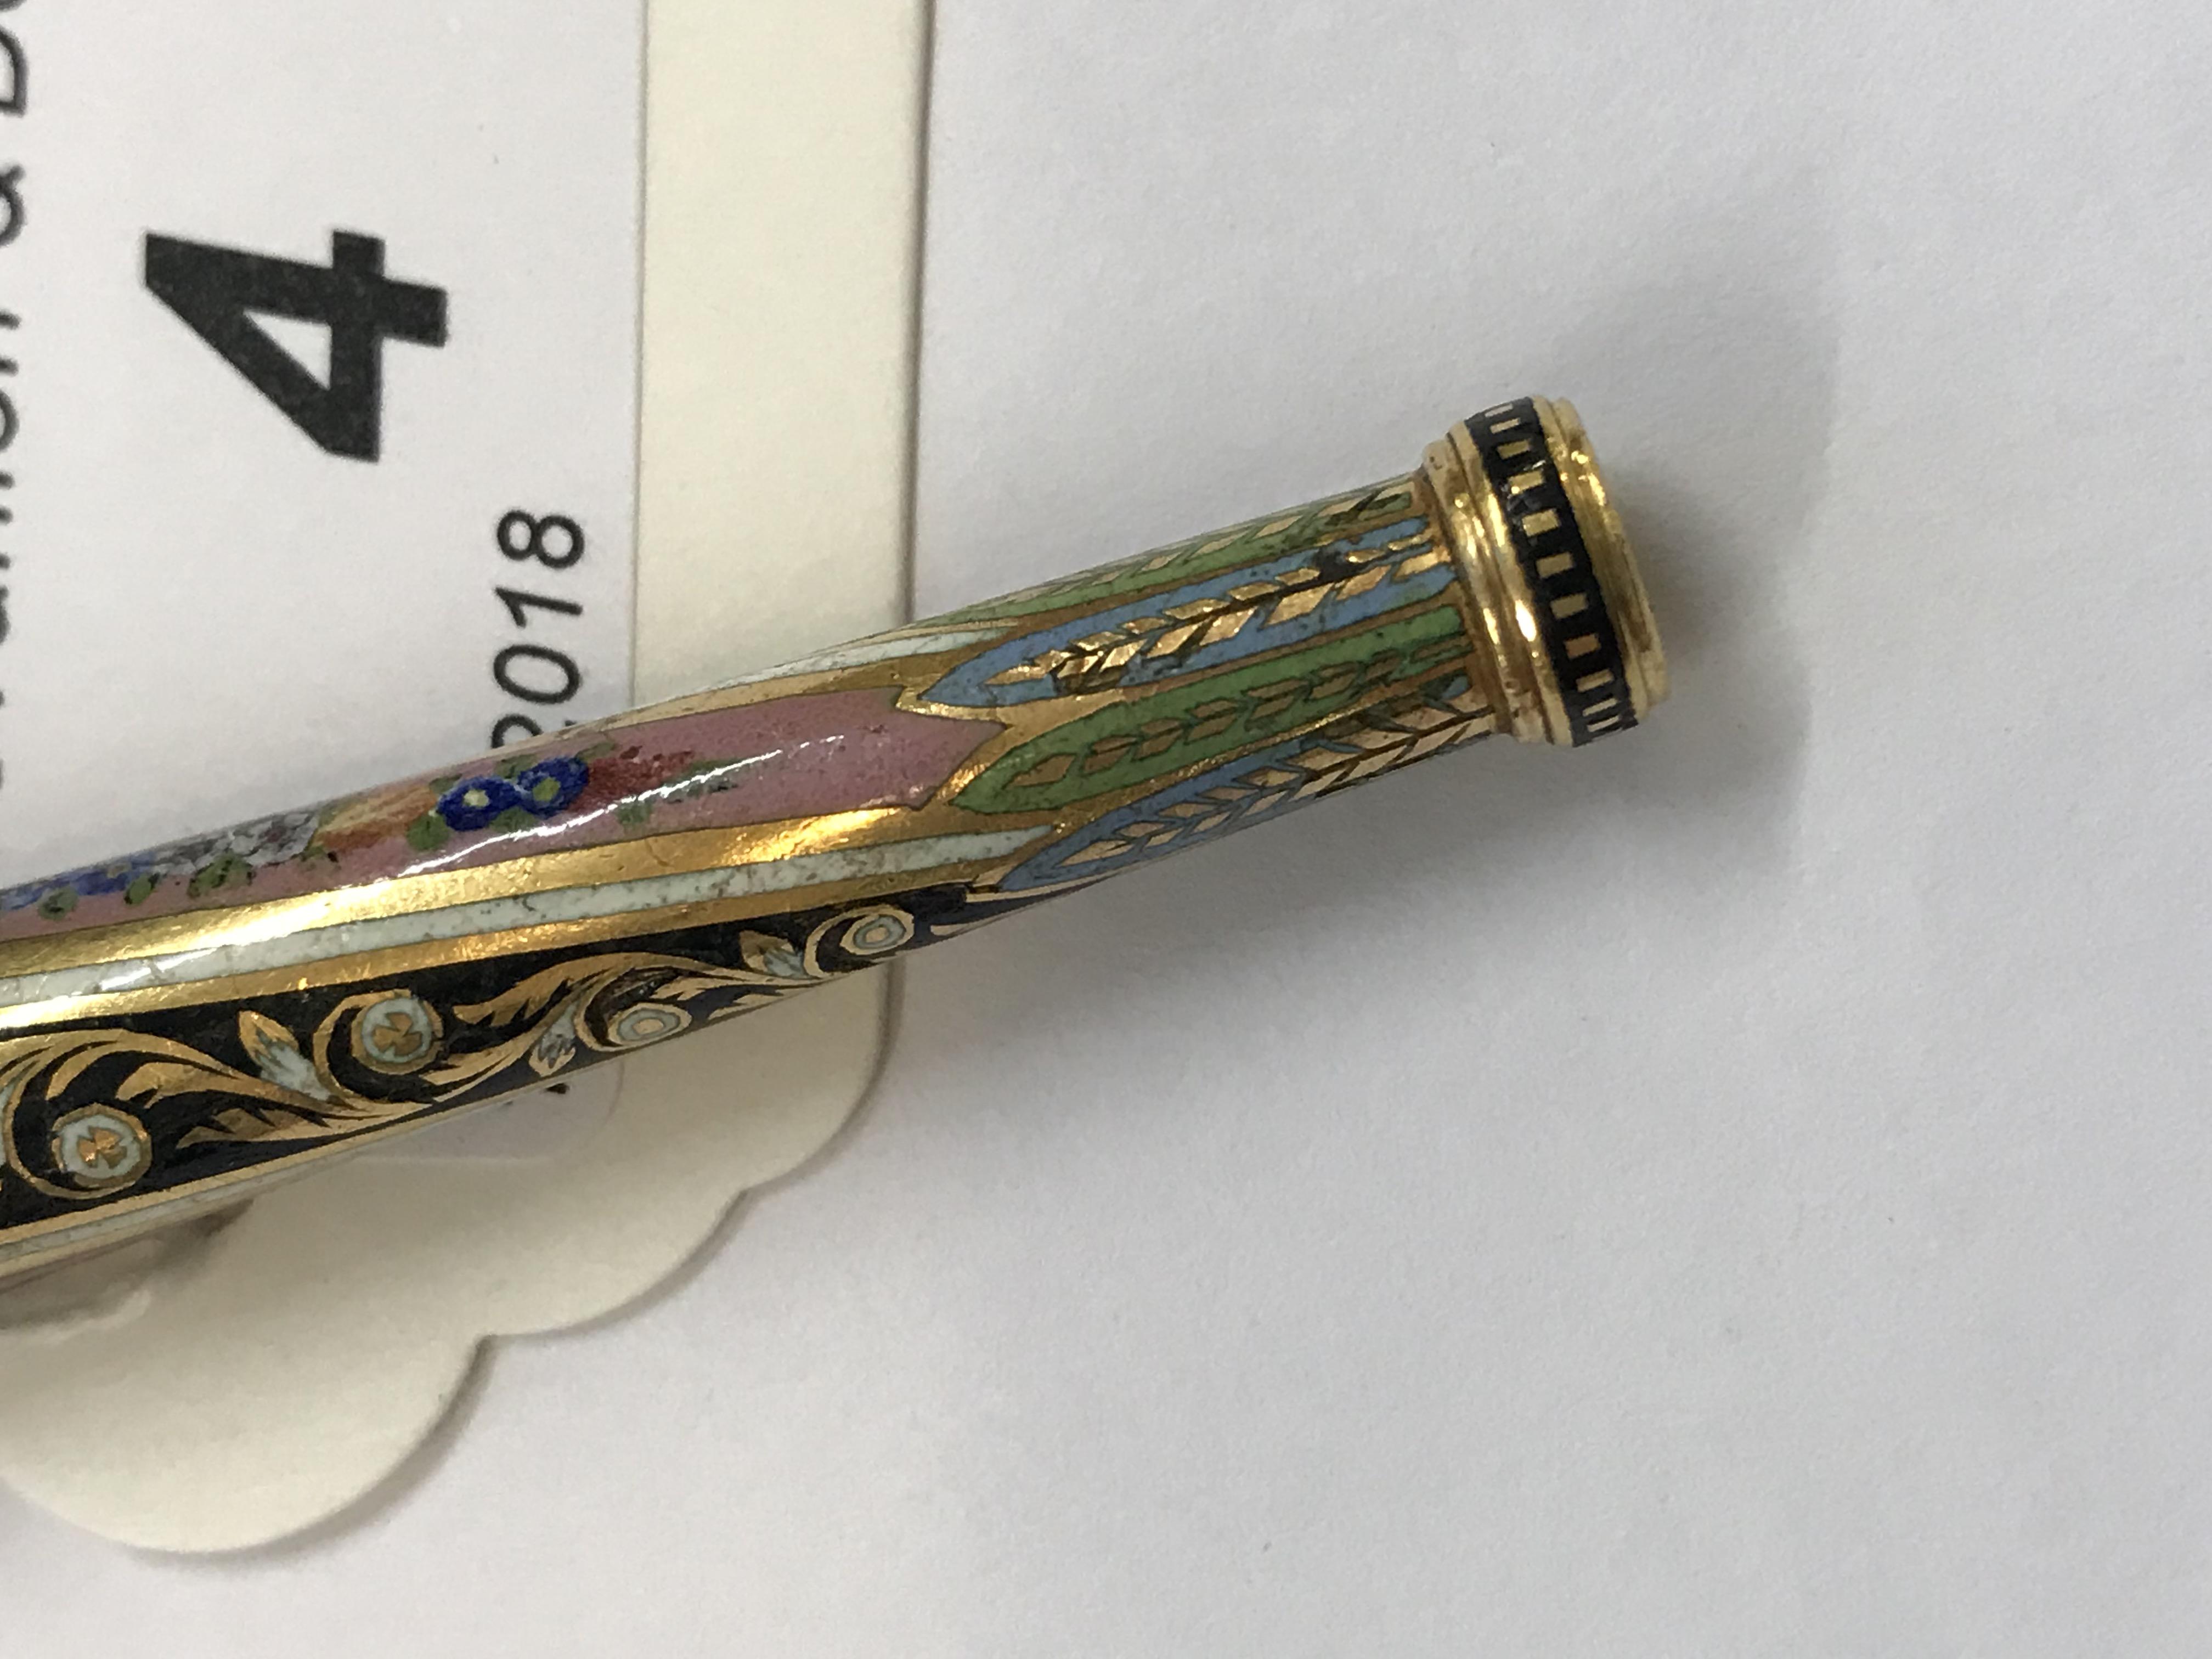 Lot 4 - A 19th century European enamelled and gilt metal cigarette holder,